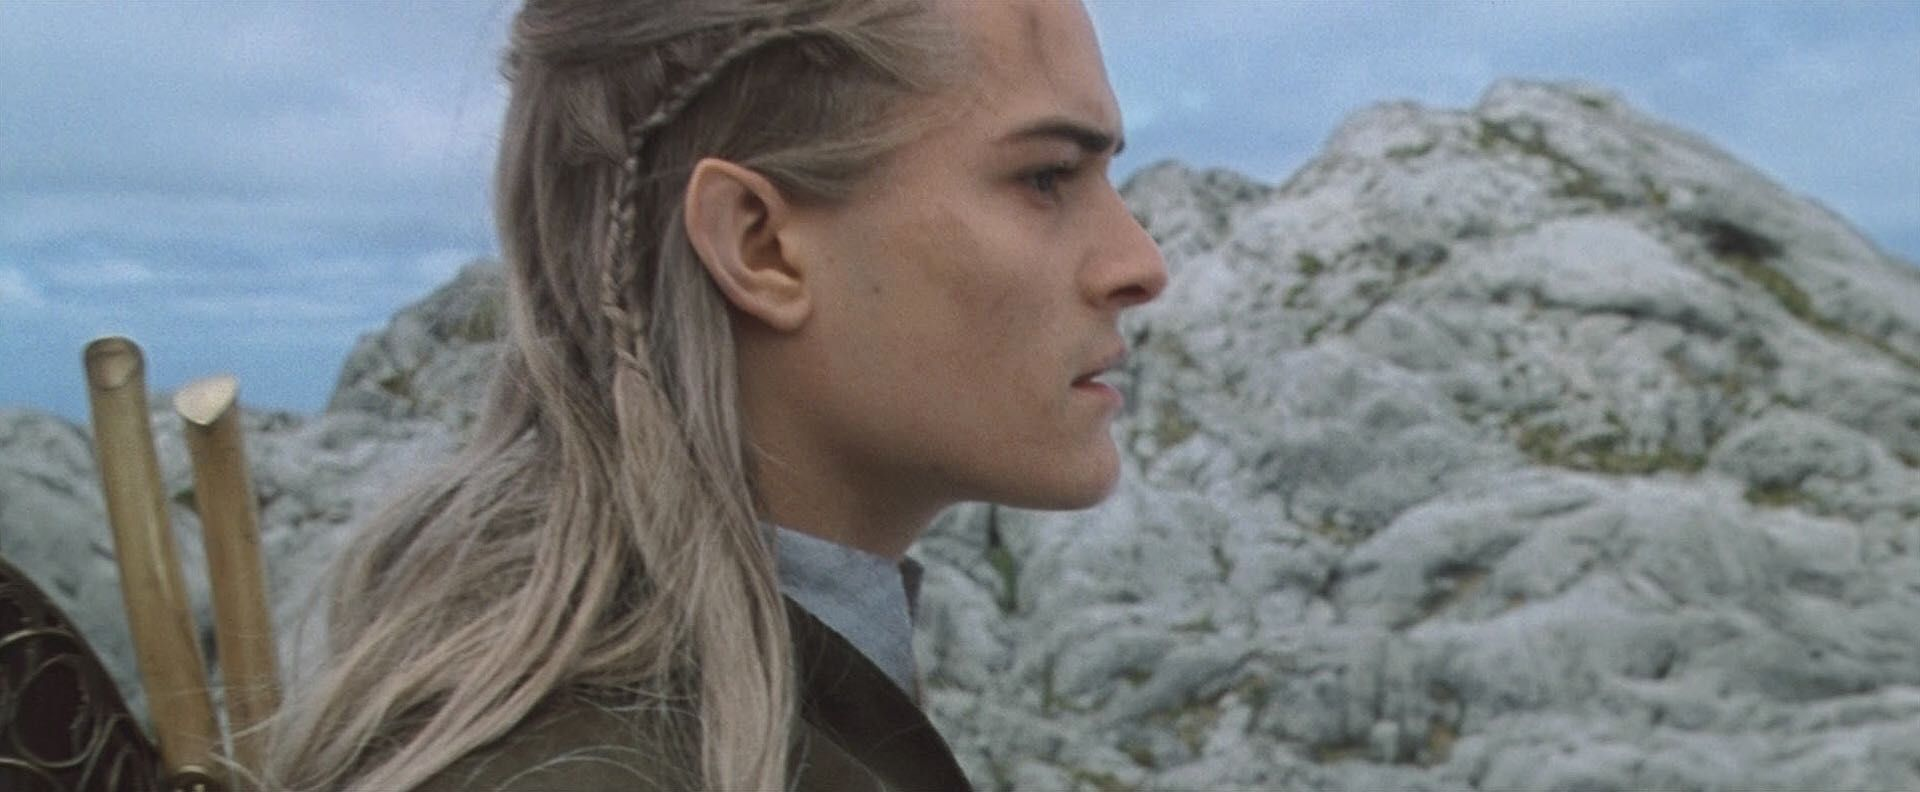 On The Edge Of Death (Legolas/Haldir Fanfic) - Emilia's ...